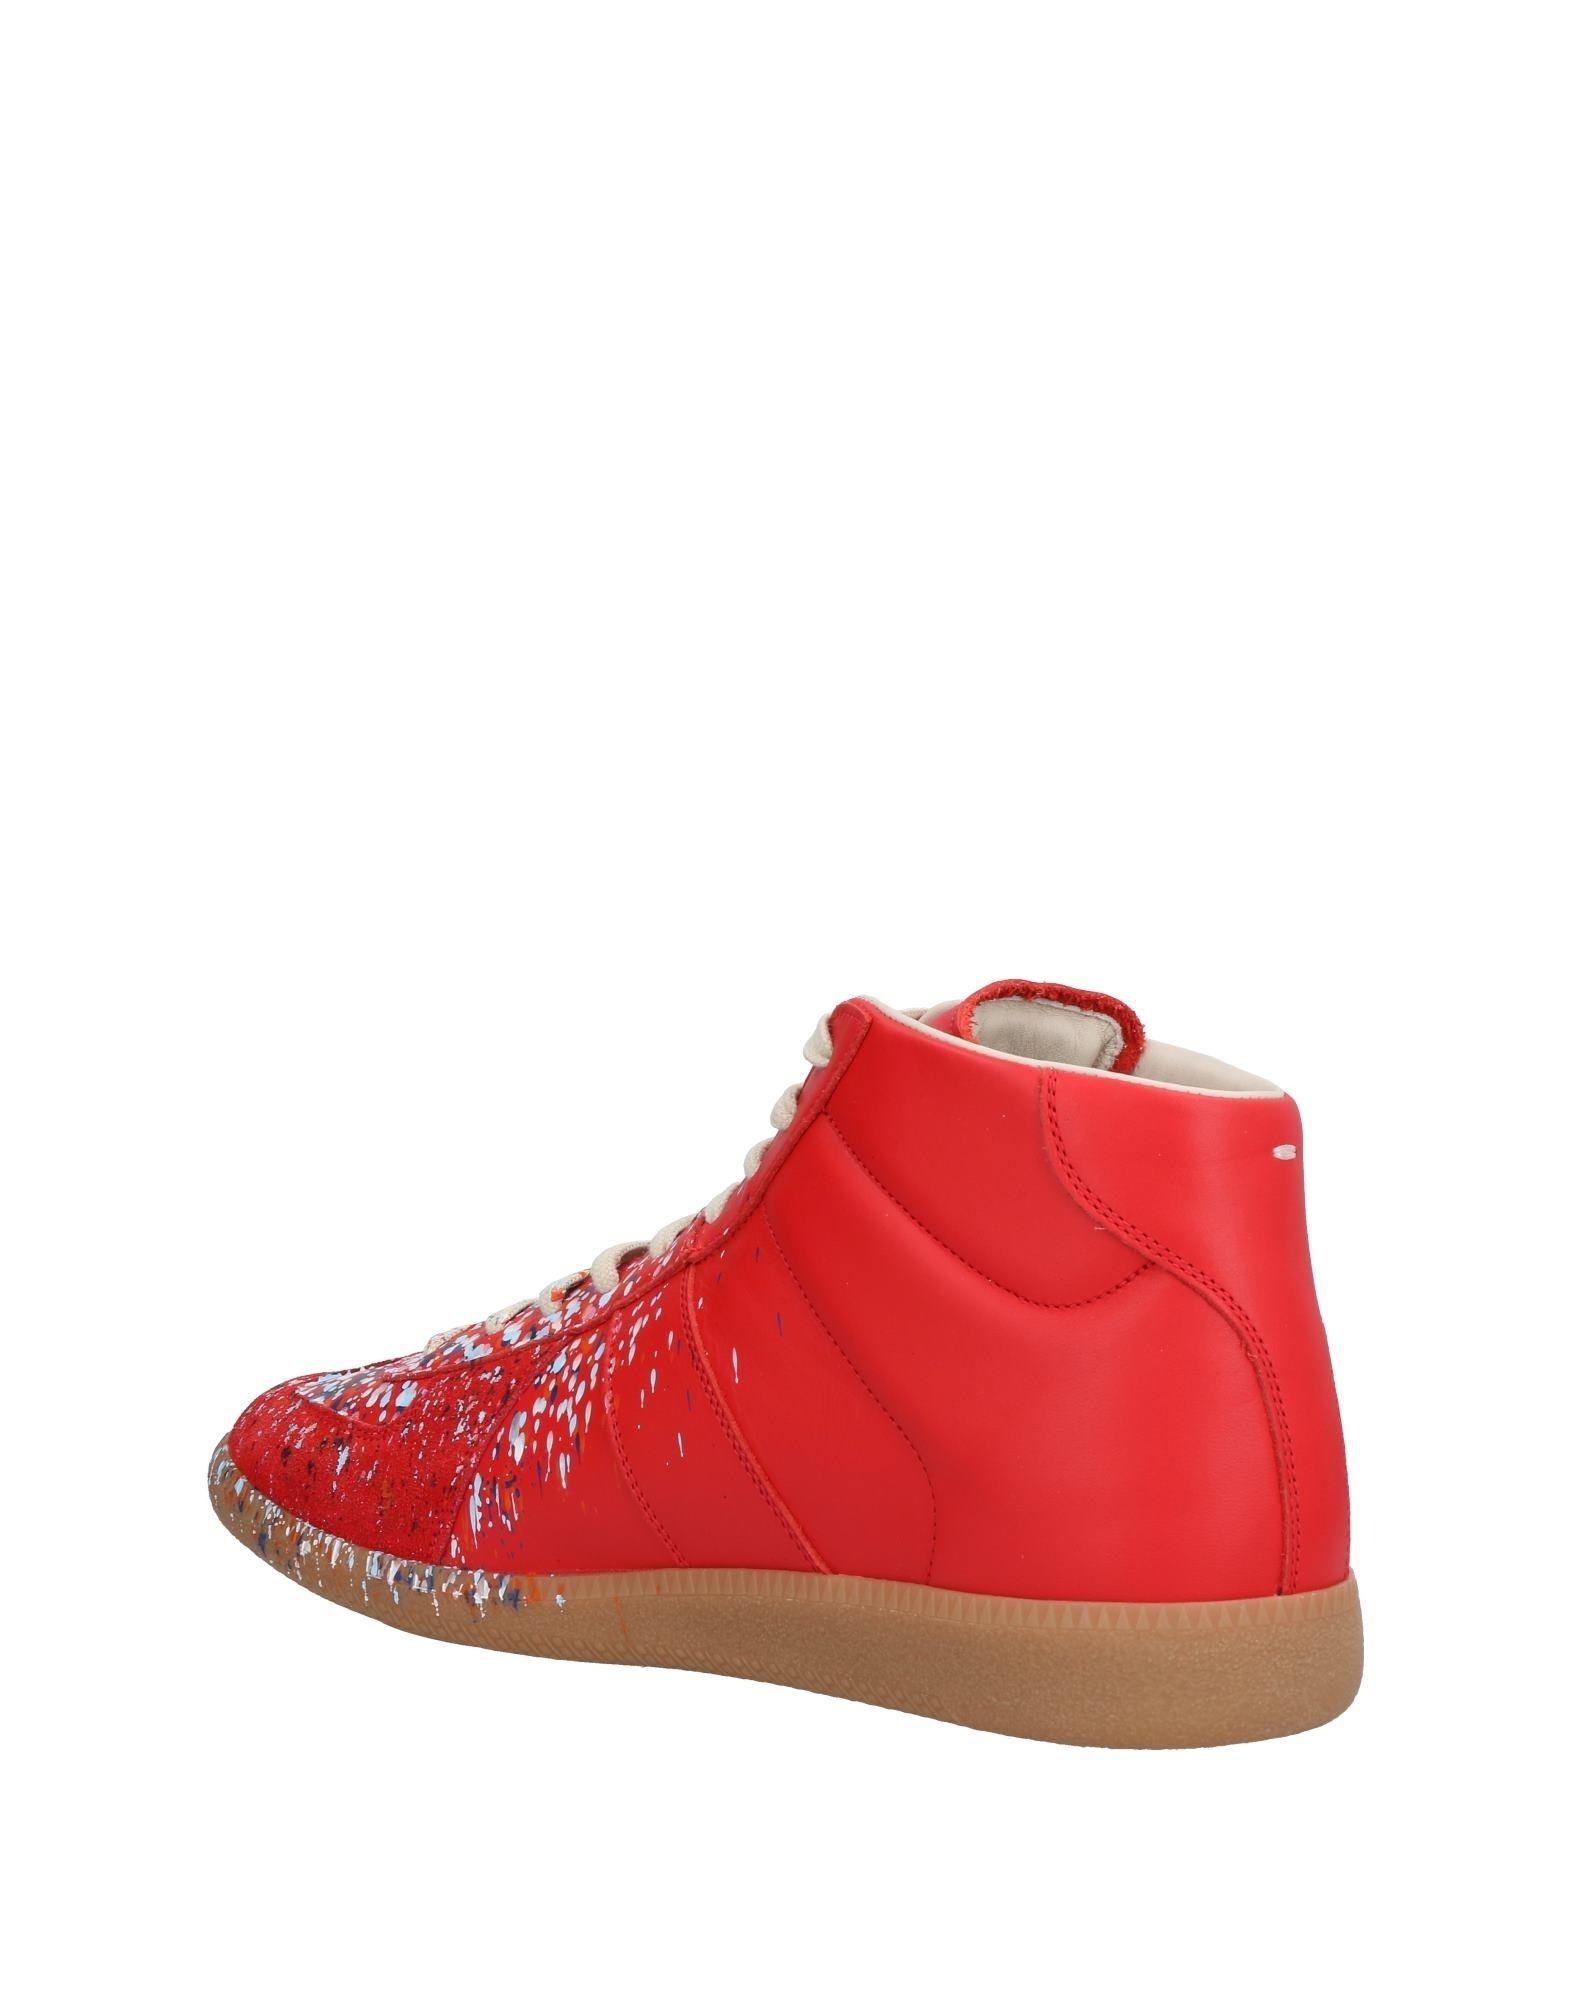 Maison Sneakers Margiela Sneakers Maison Herren  11472304WN c1a2a6